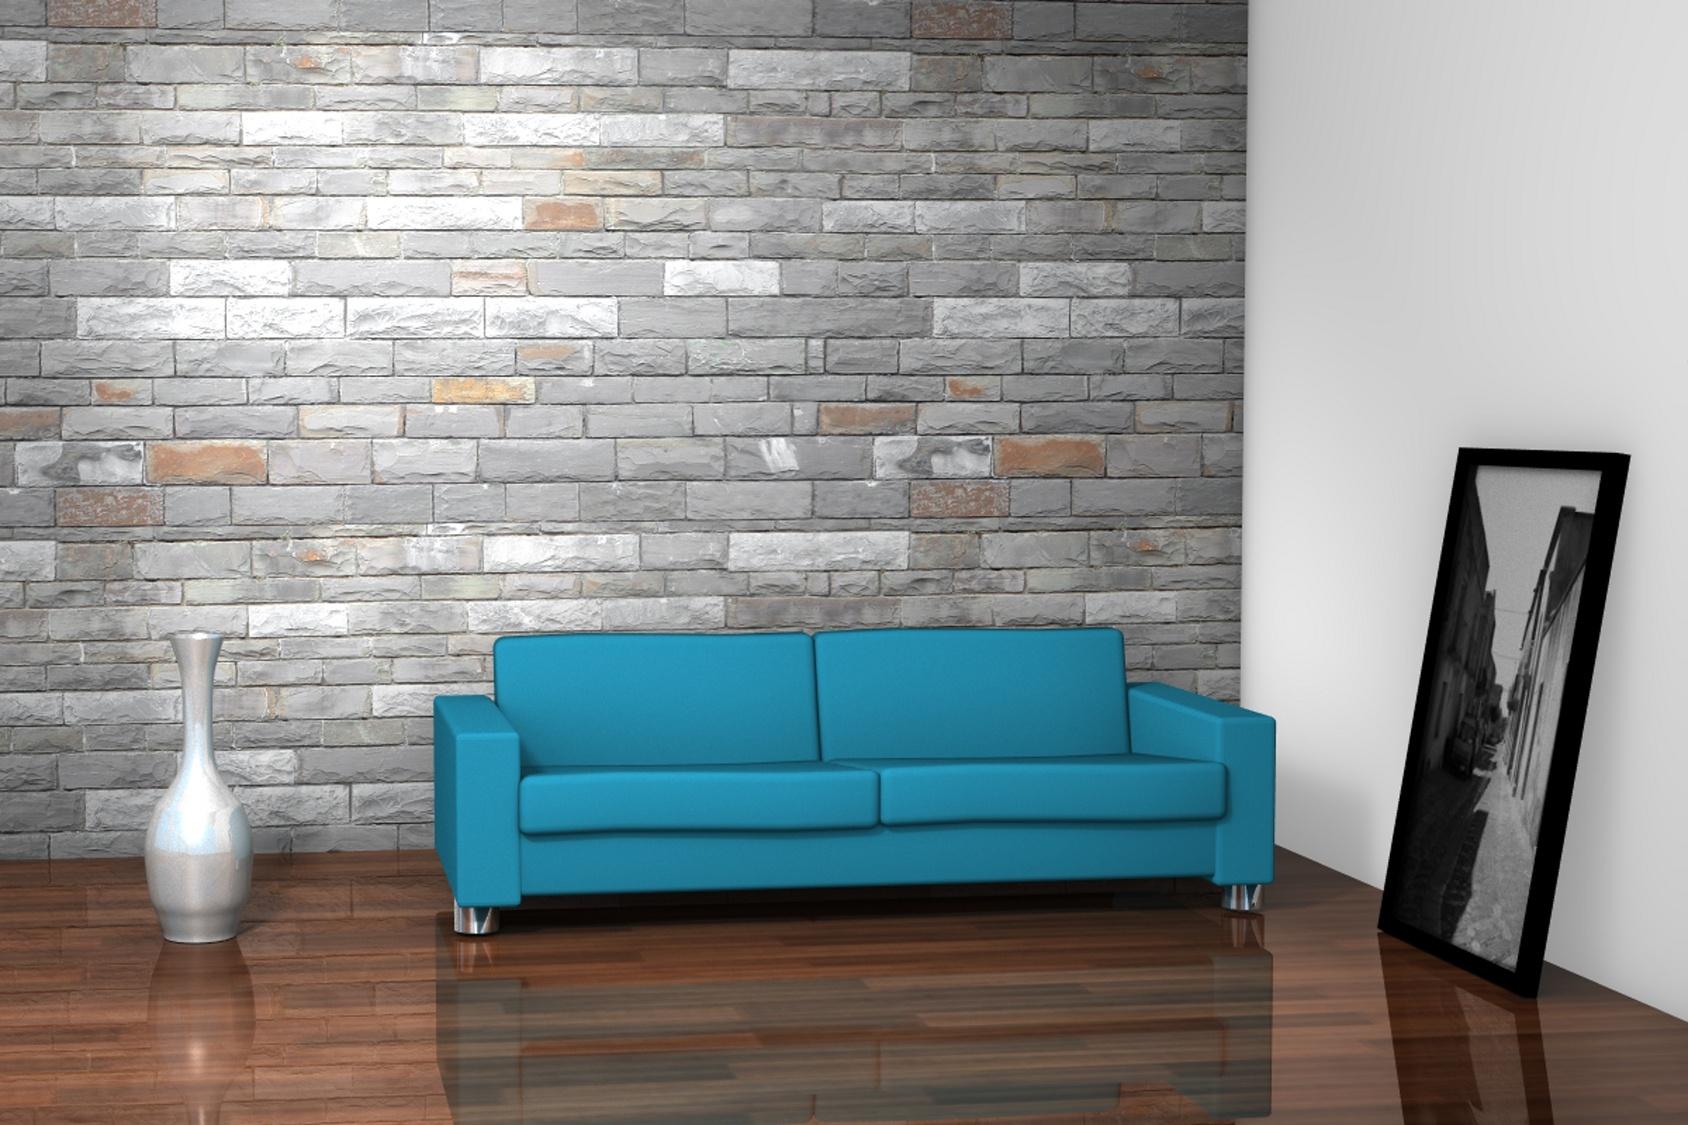 terrassen zaun spielger te kvh bsh osb schaumburg hannover hildesheim kampagnen details holz. Black Bedroom Furniture Sets. Home Design Ideas